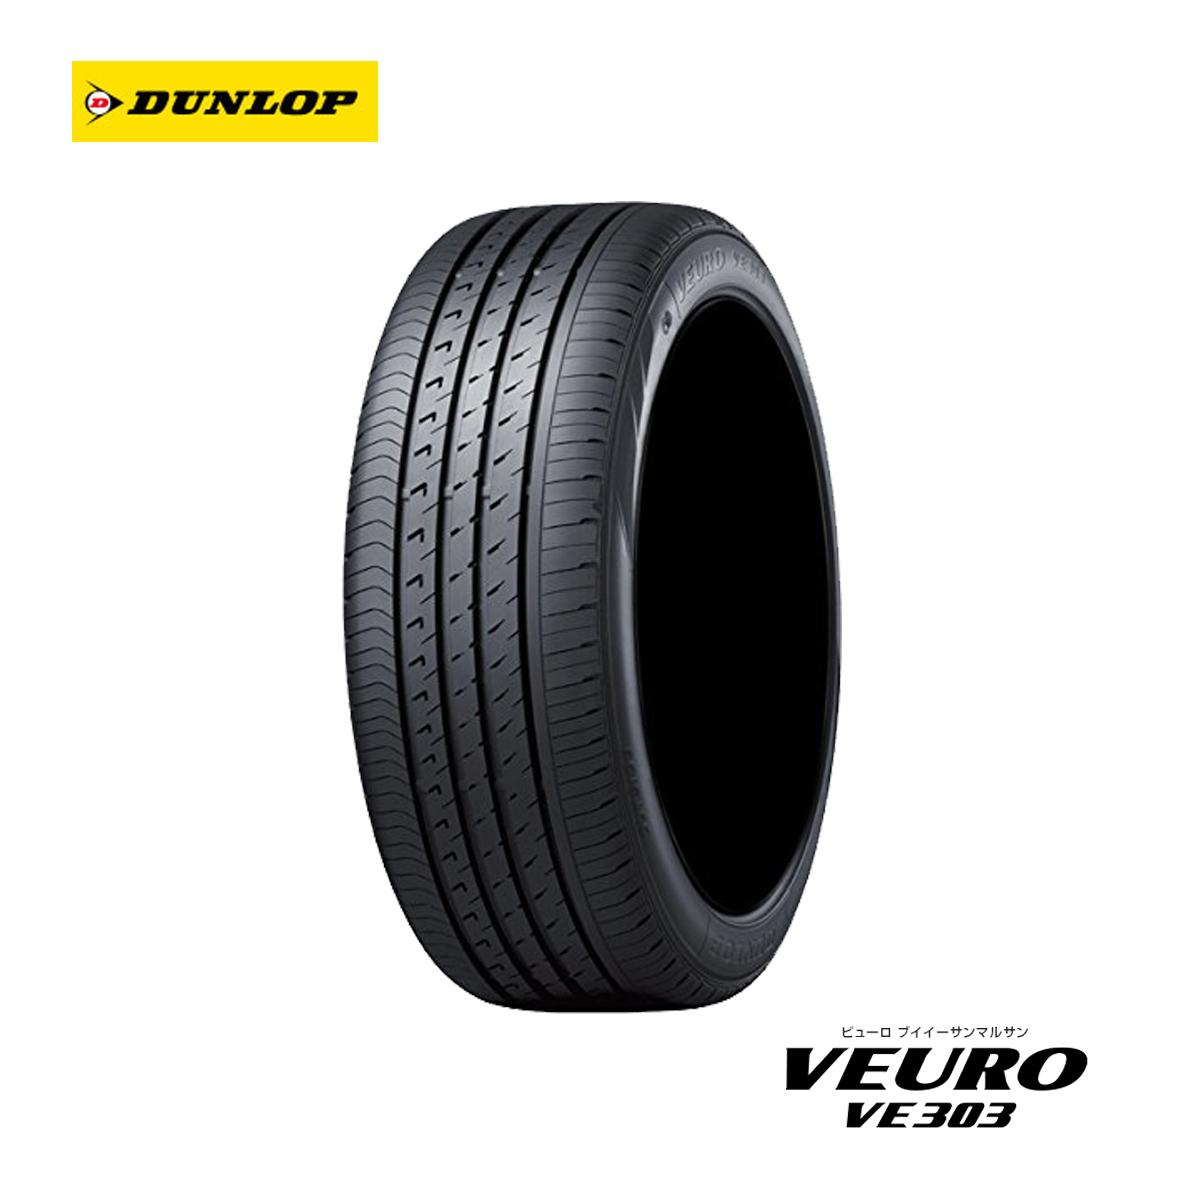 DUNLOP ダンロップ 吸音スポンジ搭載 プレミアム コンフォート 低燃費 サマータイヤ 1本 16インチ 235/60R16 VEURO VE303 ビューロ